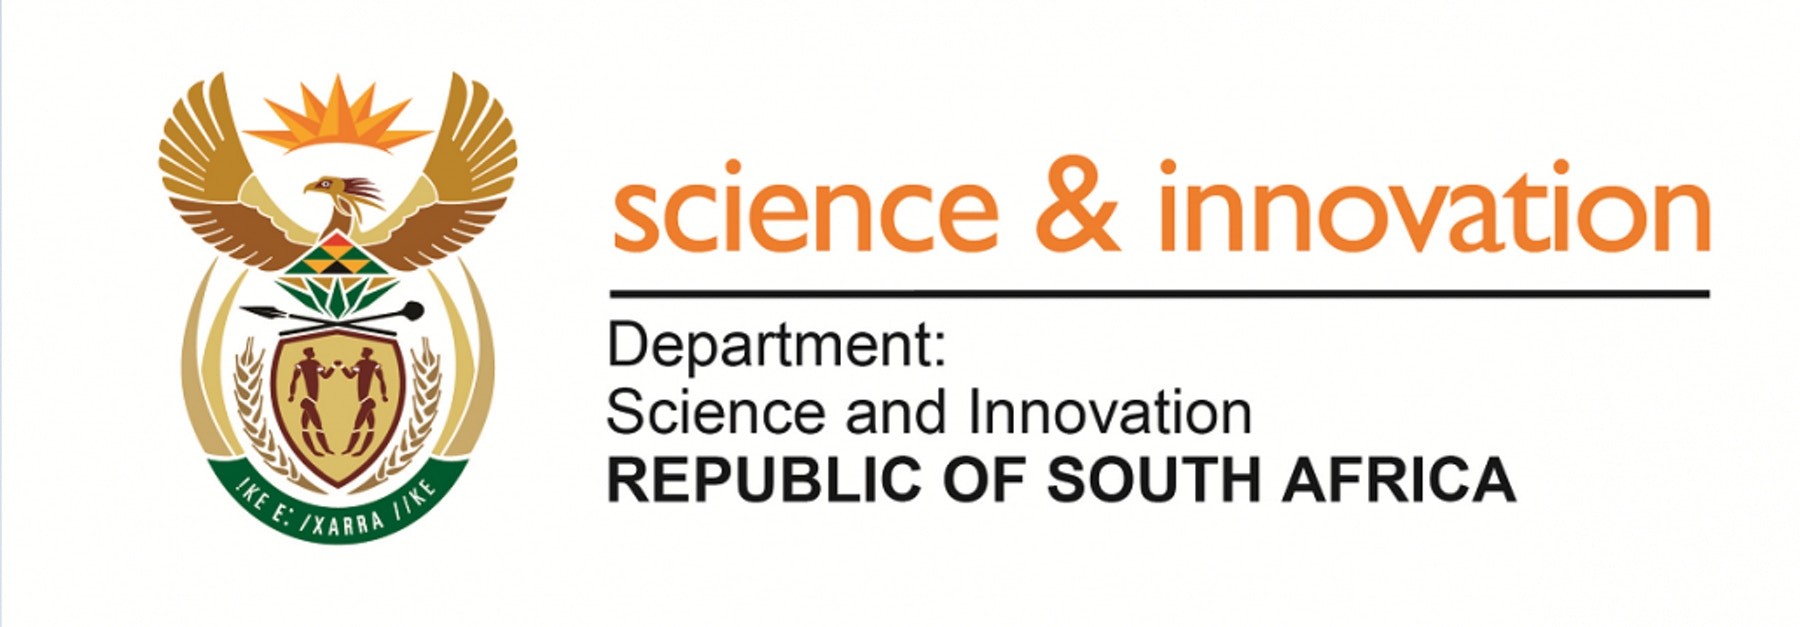 DSI logo 1030x359 png